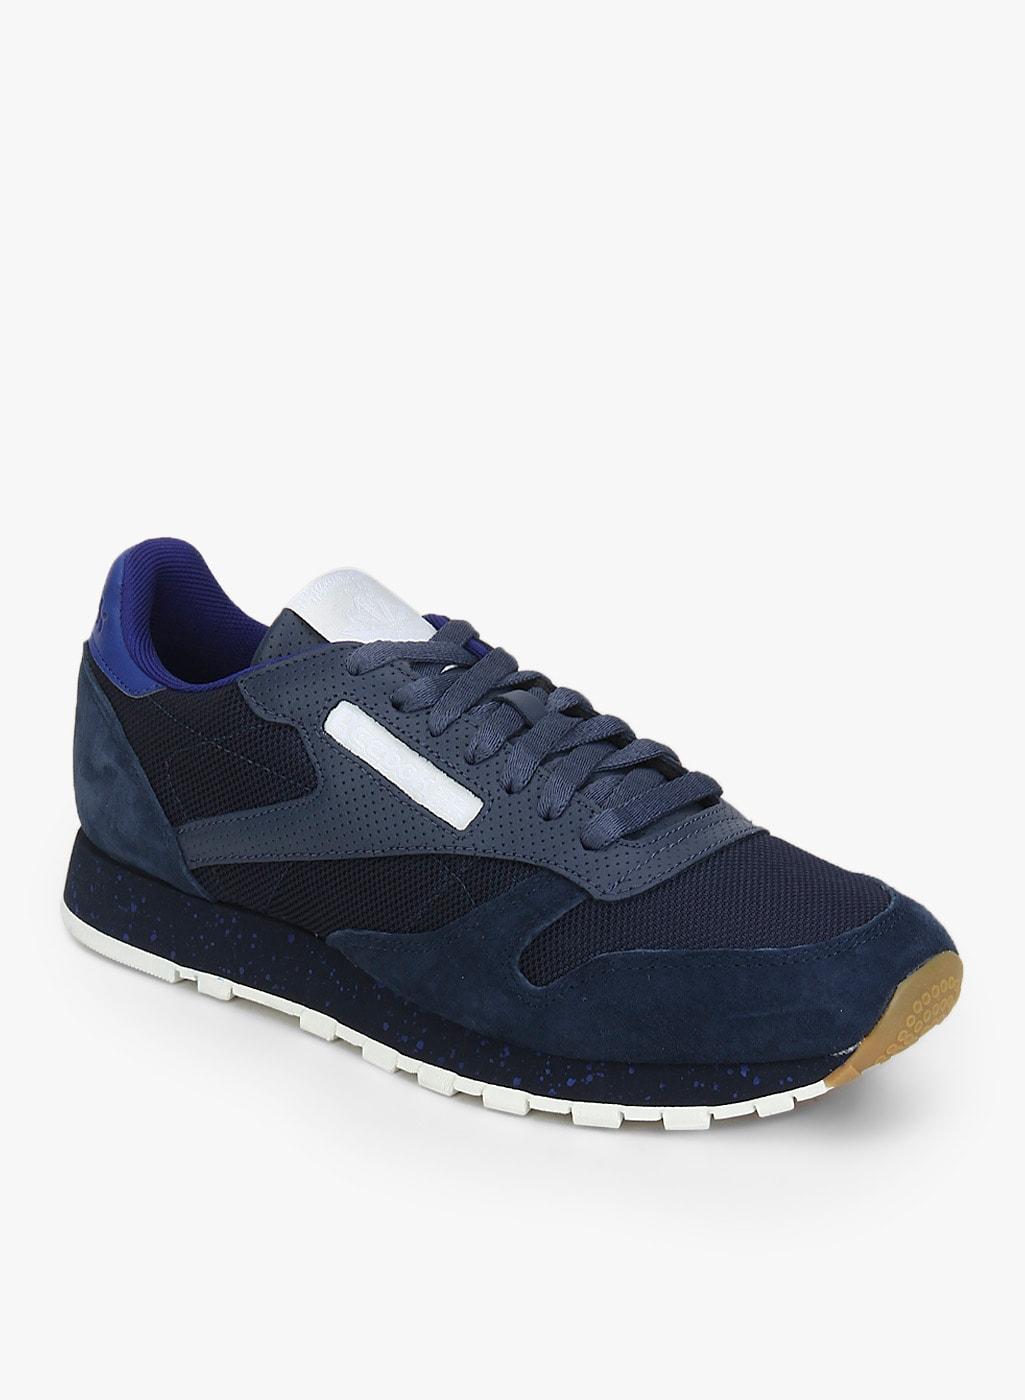 ed41c8f5862 Reebok Men Casuals Casual Shoes - Buy Reebok Men Casuals Casual Shoes  online in India